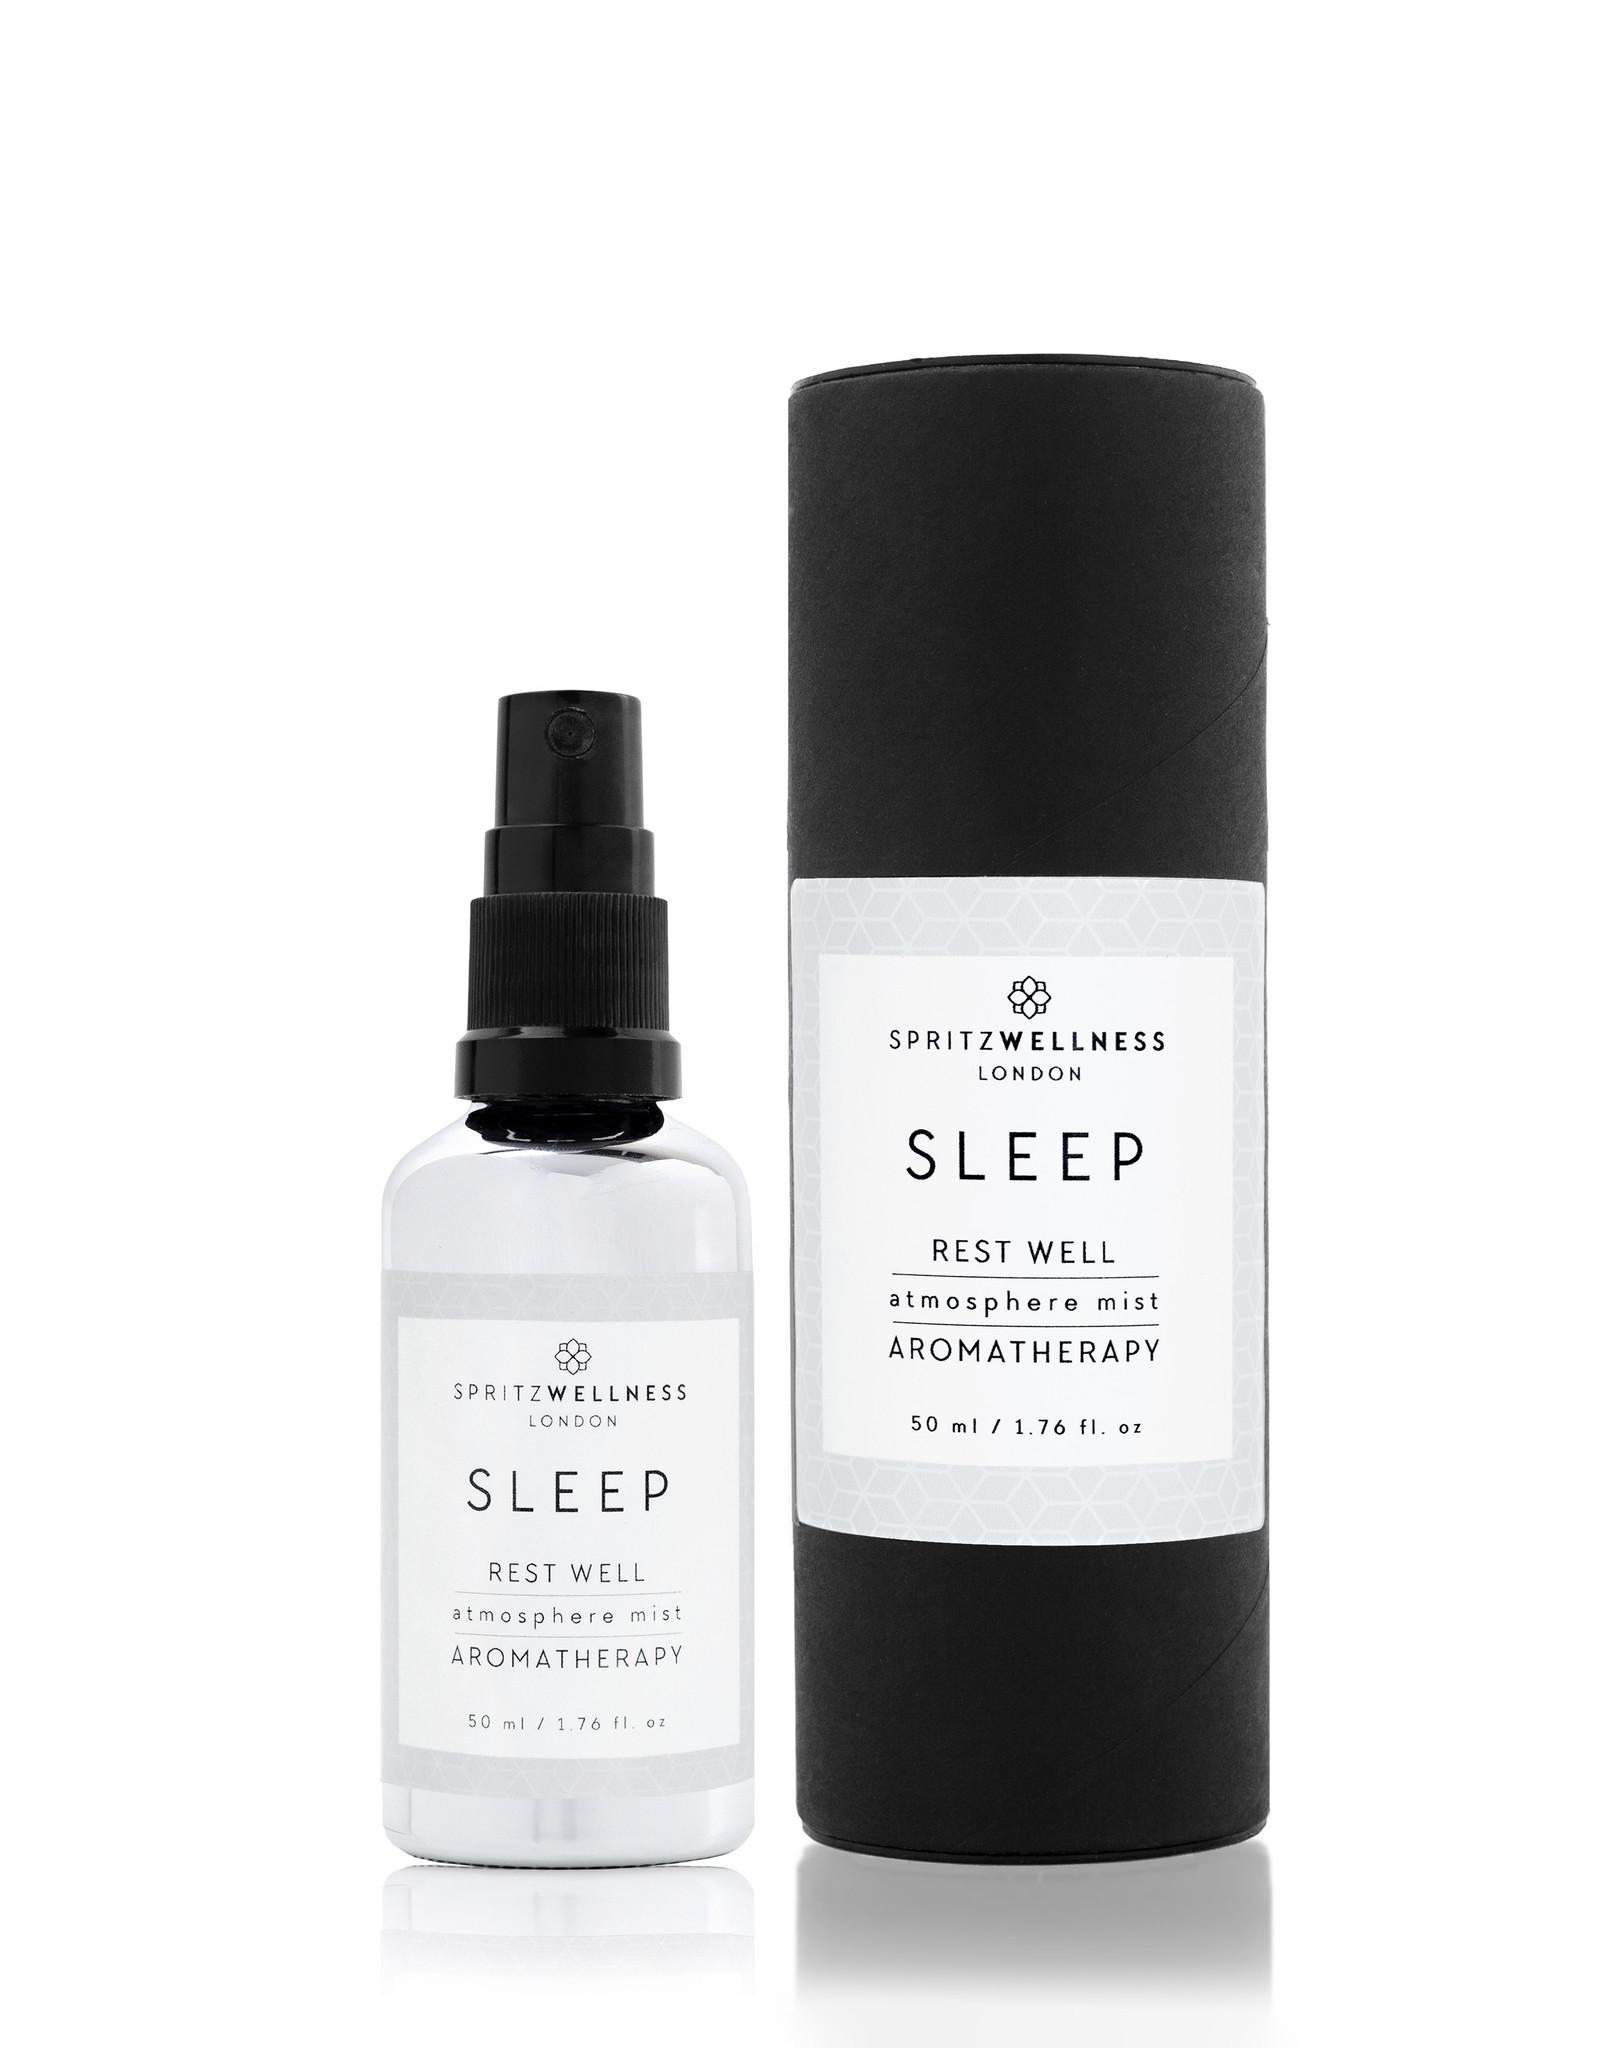 Spritz Wellness London 'Sleep' atmosfeer mist